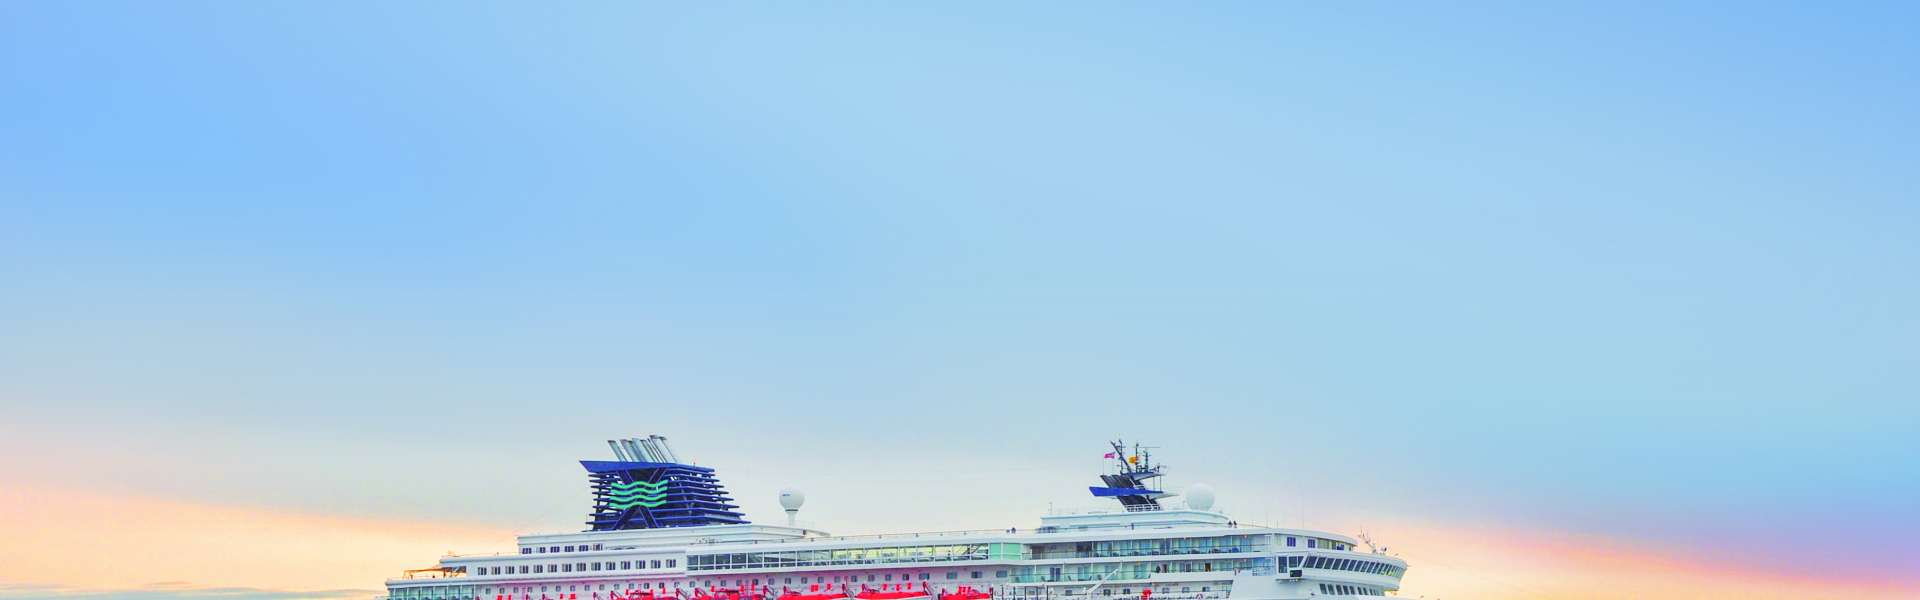 Croaziera 2019 - Europa de Sud (Atena) - Pullmantur Cruises - Horizon - 7 nopti